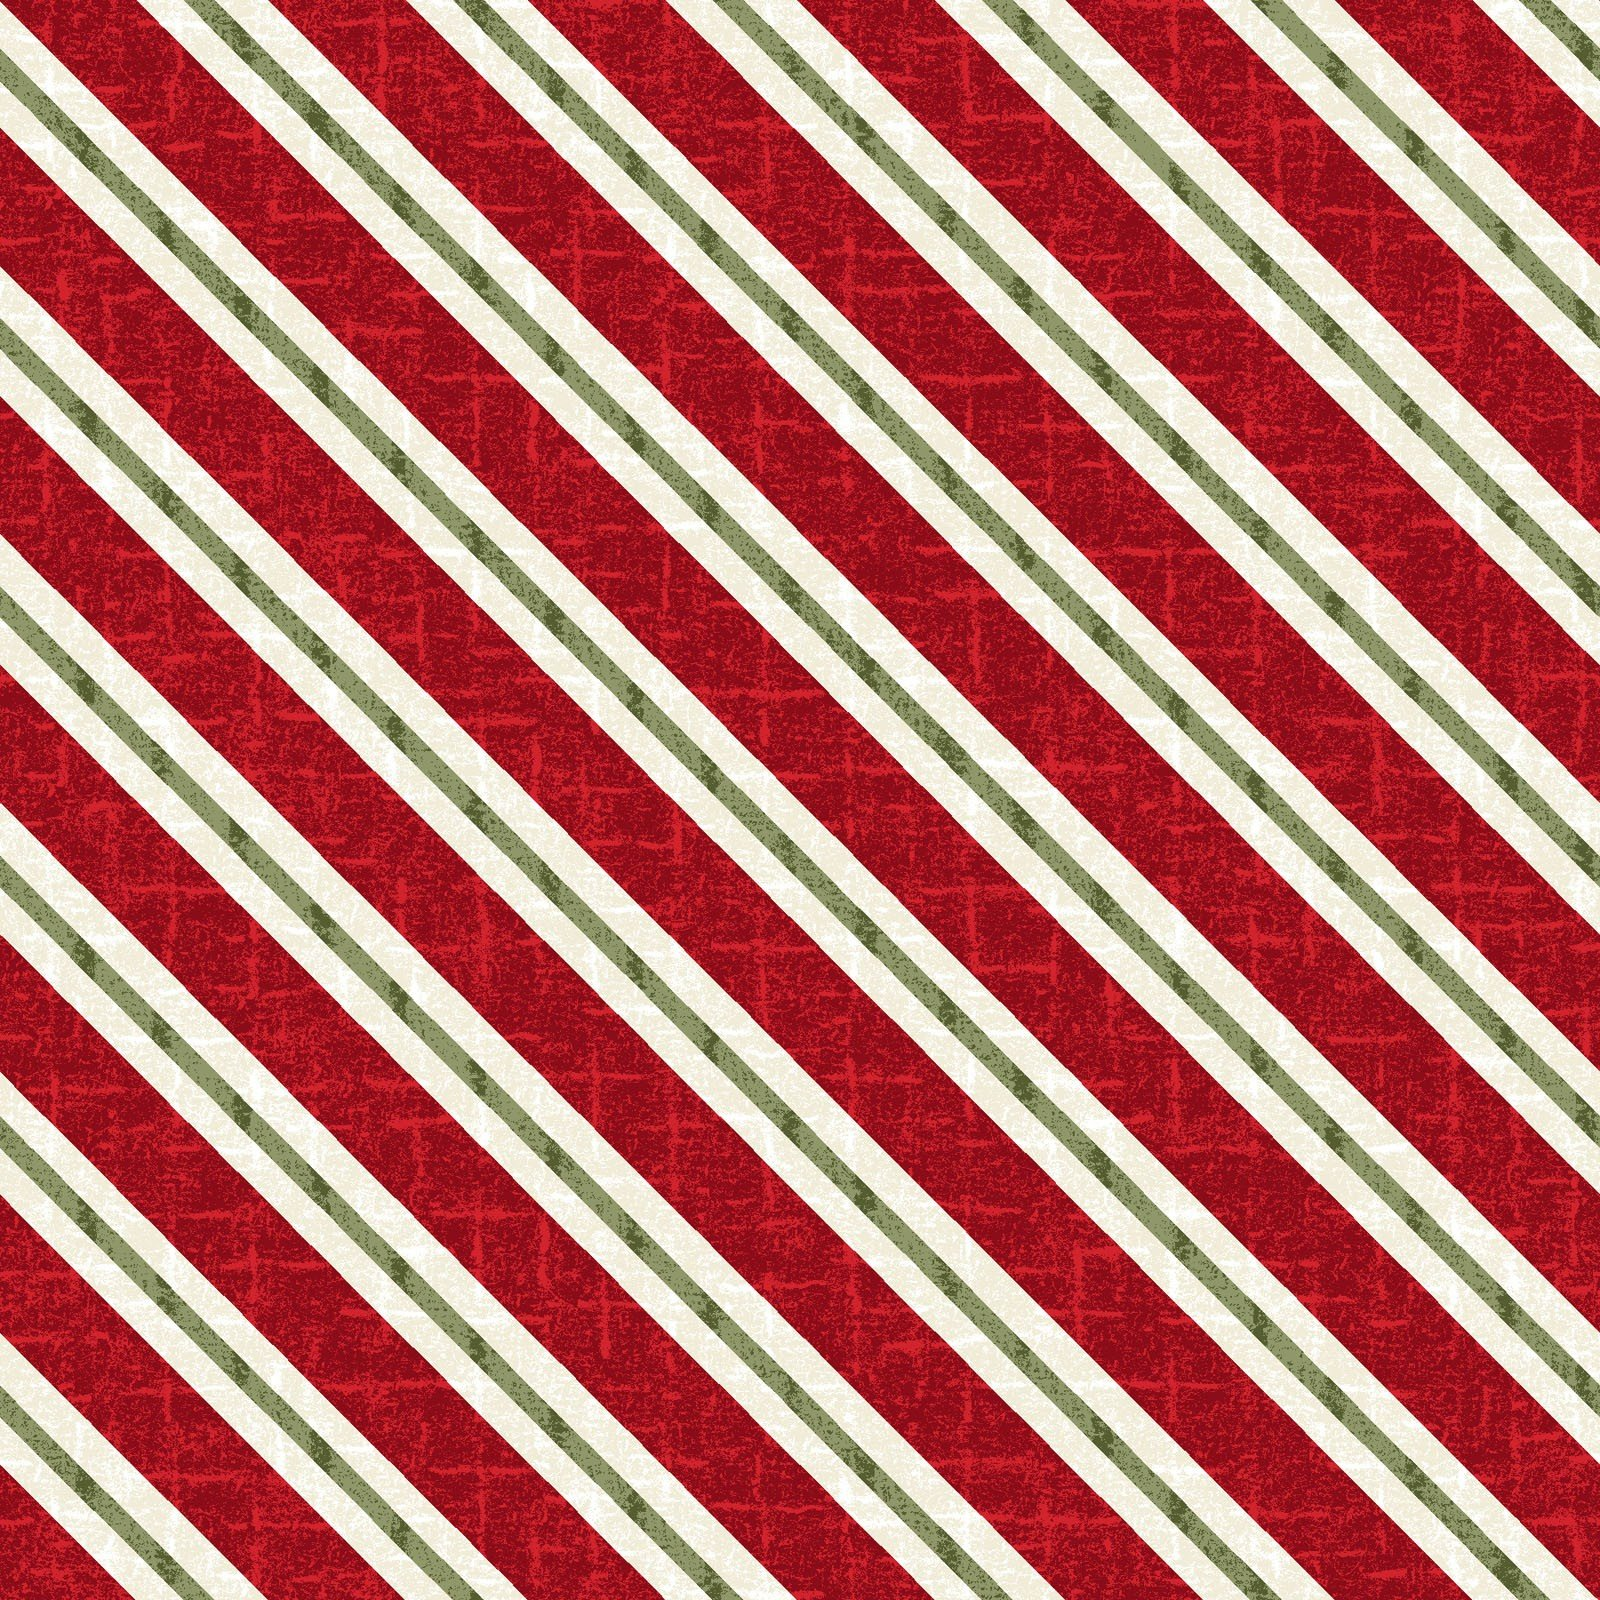 Red Candy Cane Stripe - Snowdays Flannel by Bonnie Sullivan - MASF9937-R